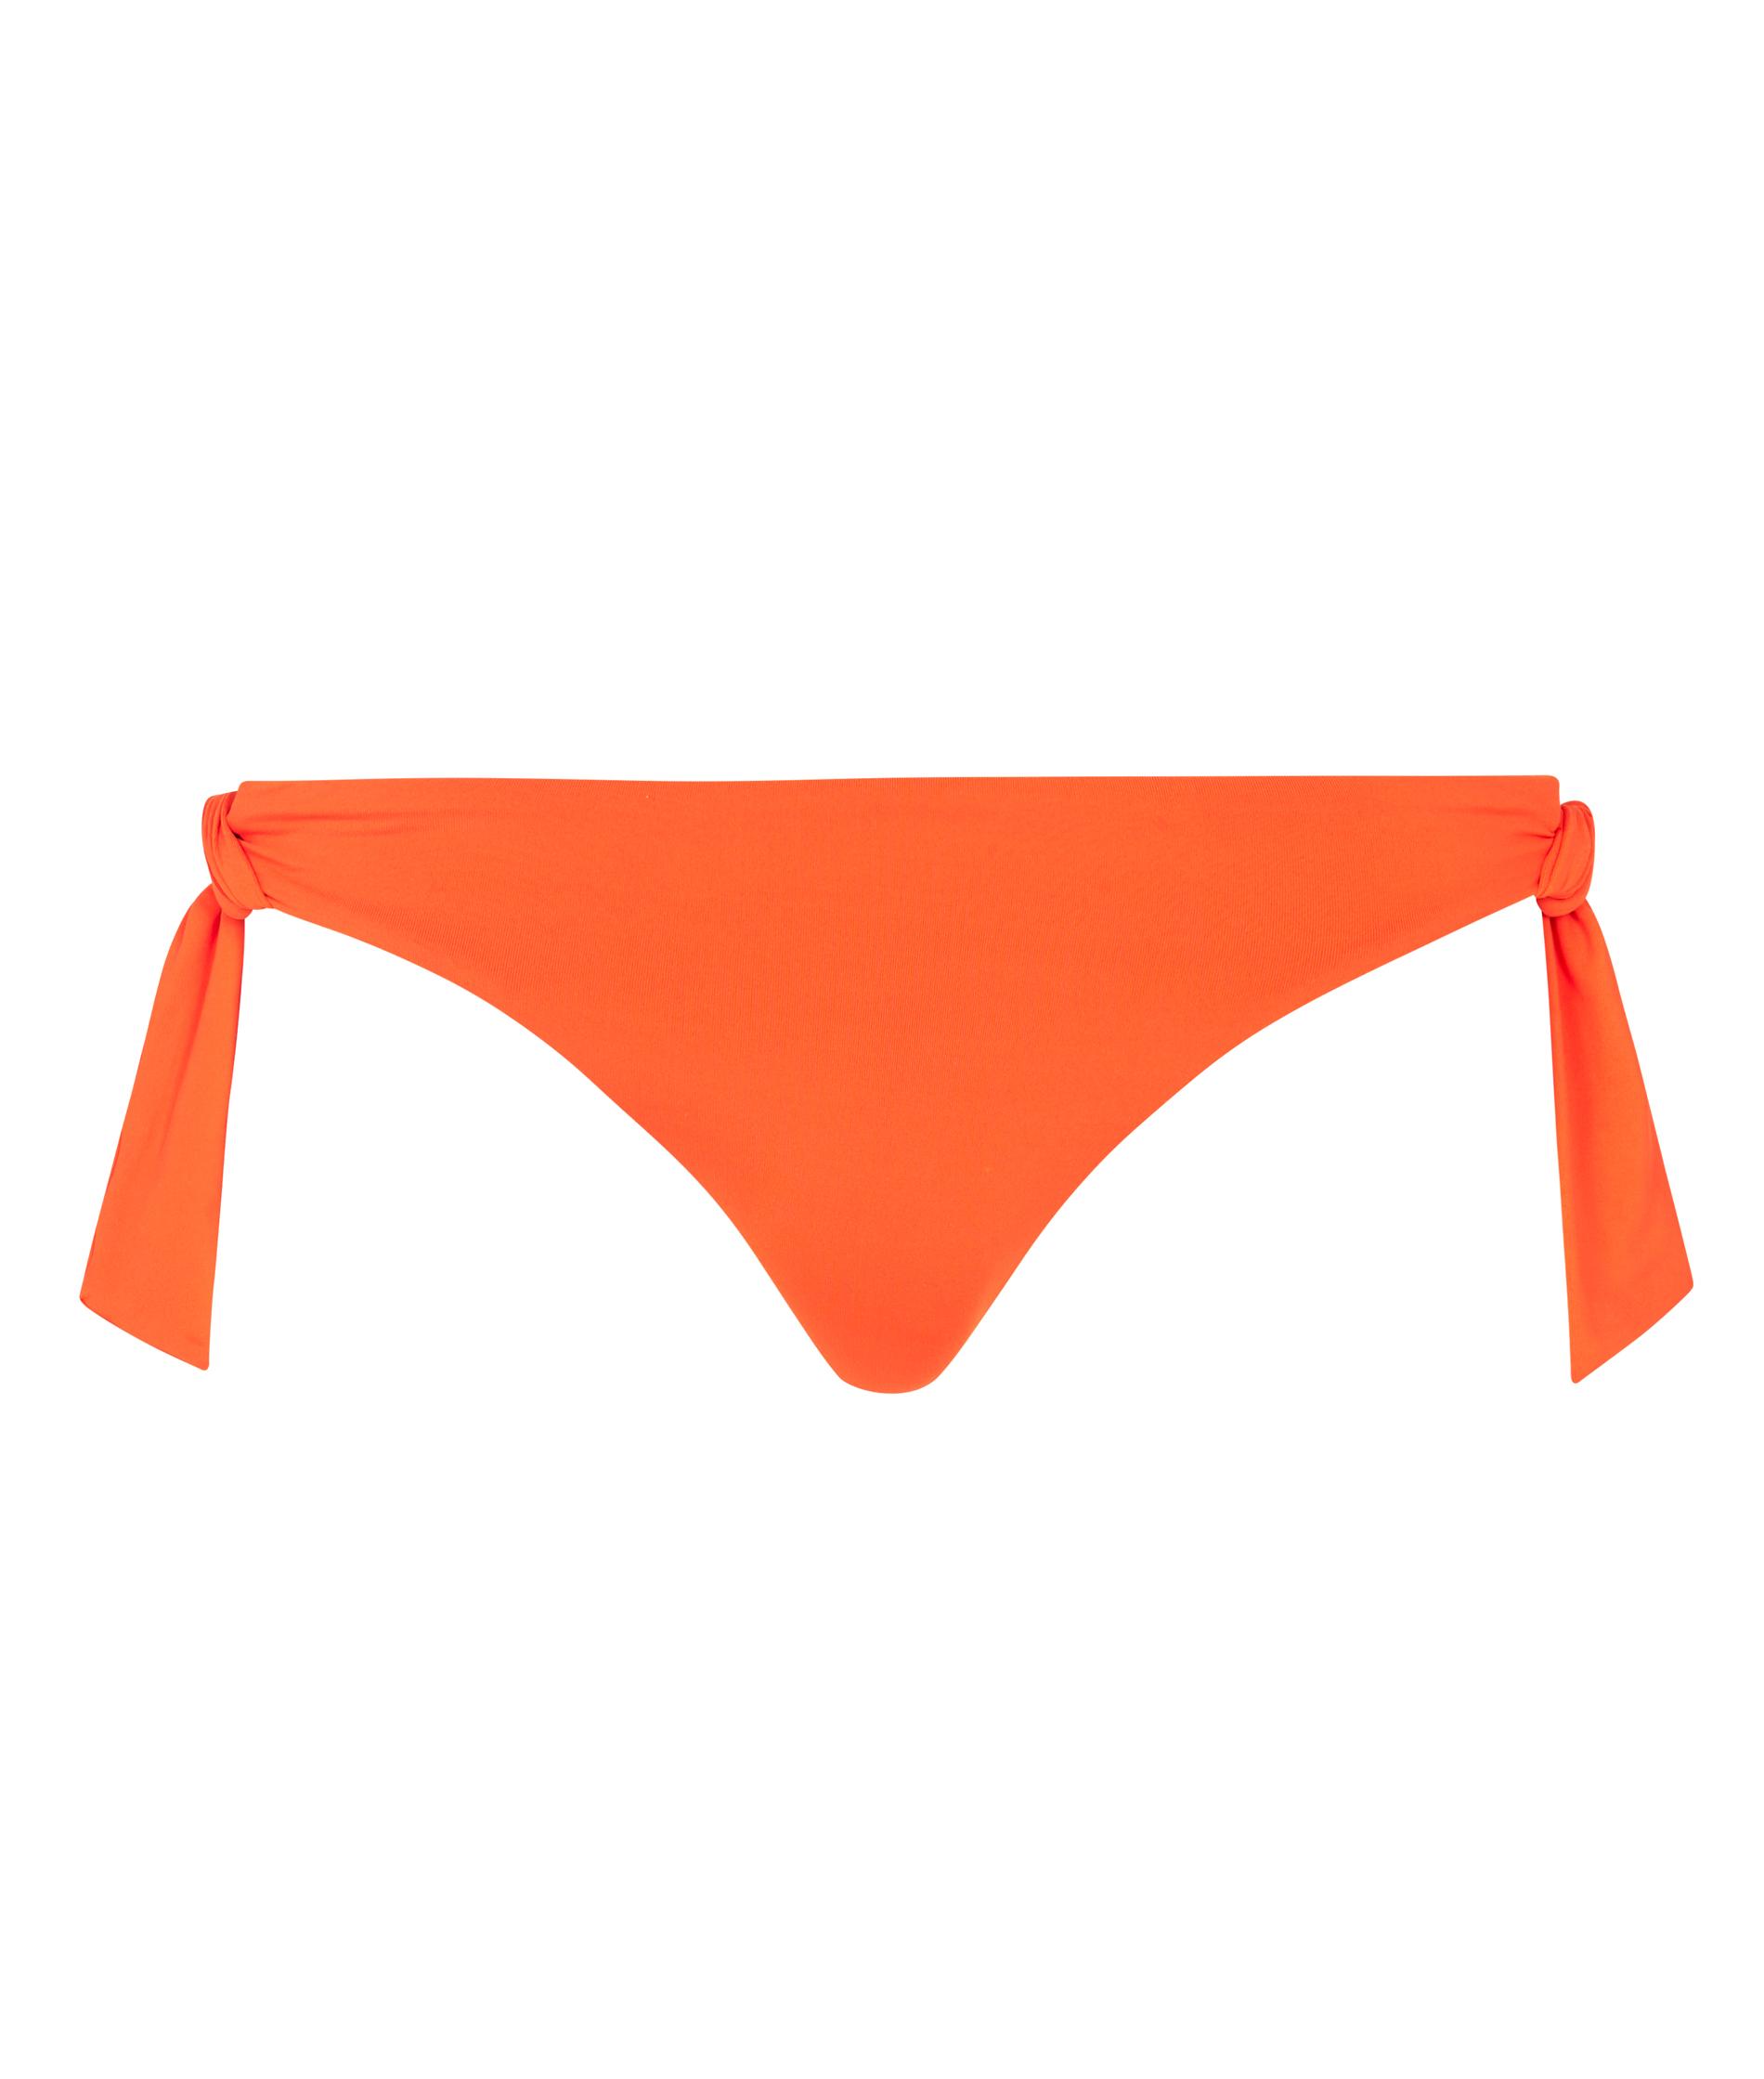 Seafolly Ladies Active Ring Side Hipster Bikini Pant - Tangelo